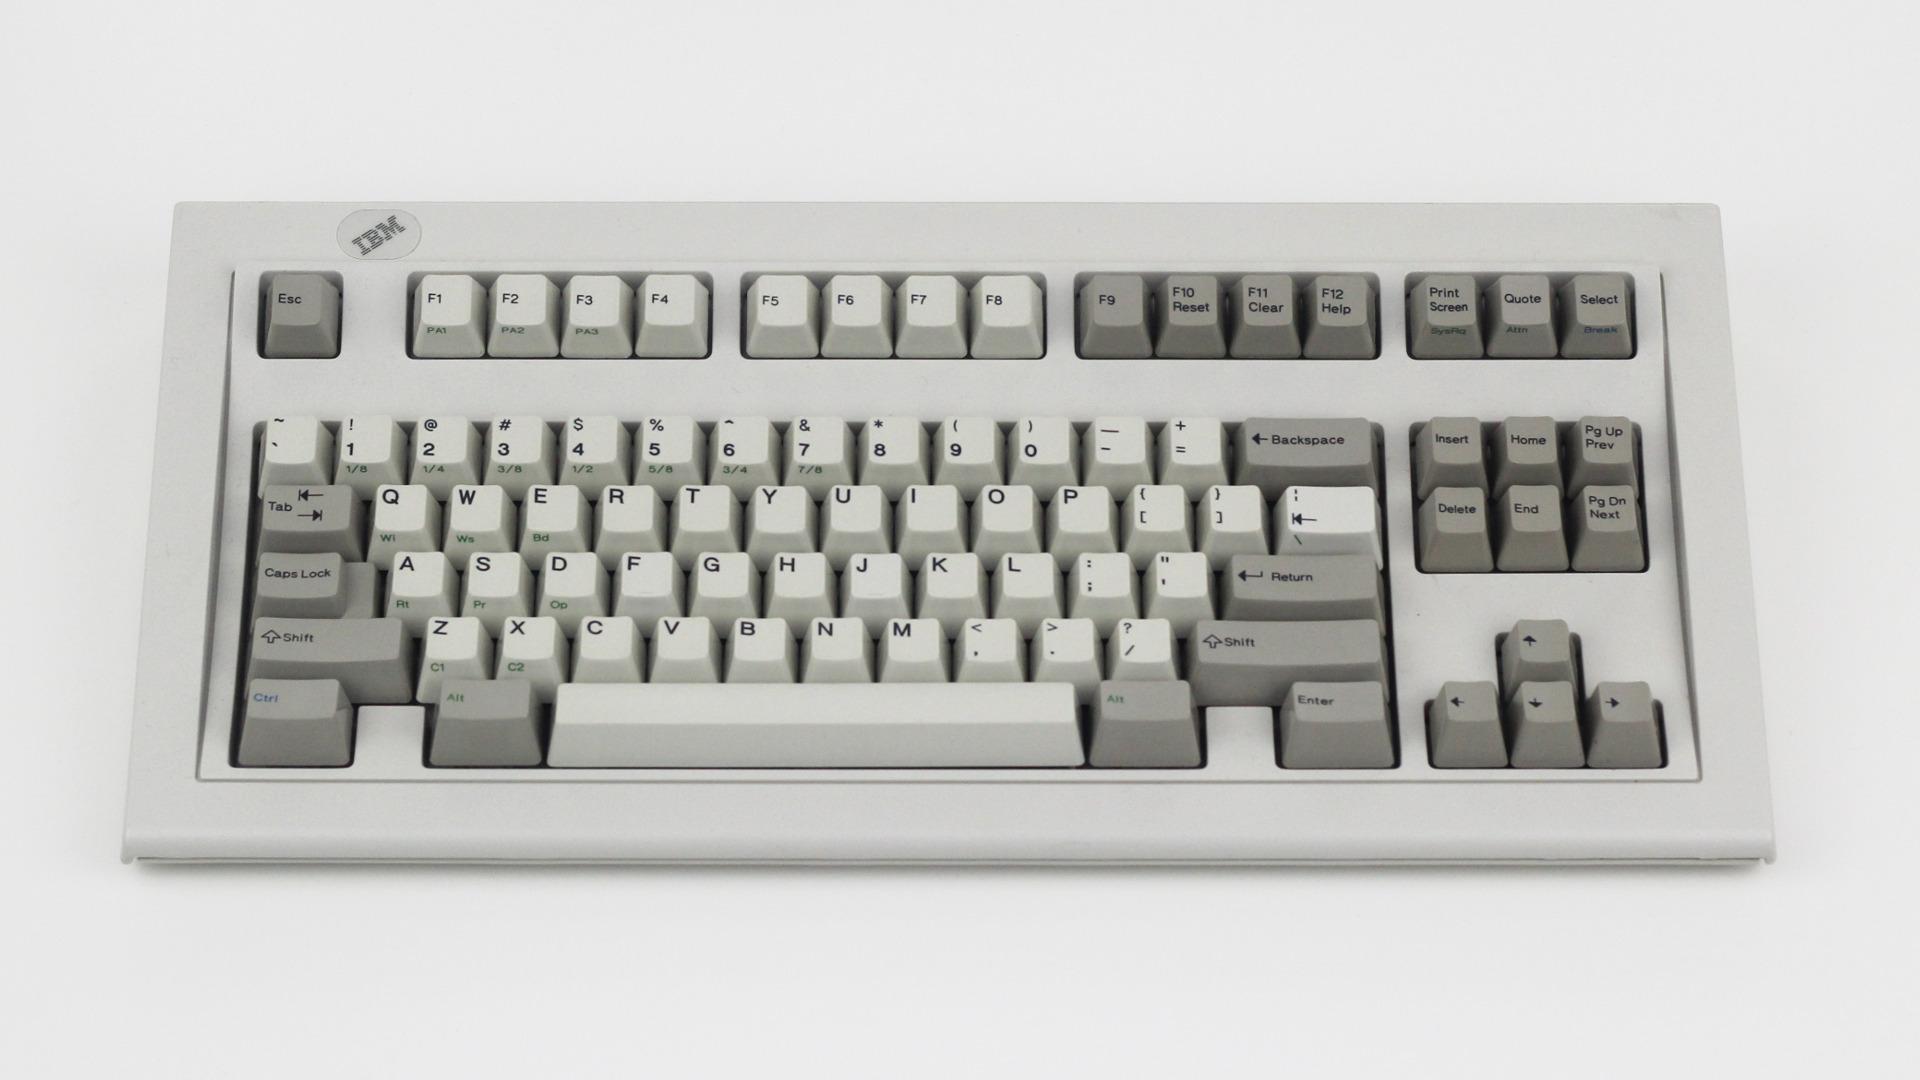 Keyboard الكيبورد لوحة المفاتيح الكمبيوتر